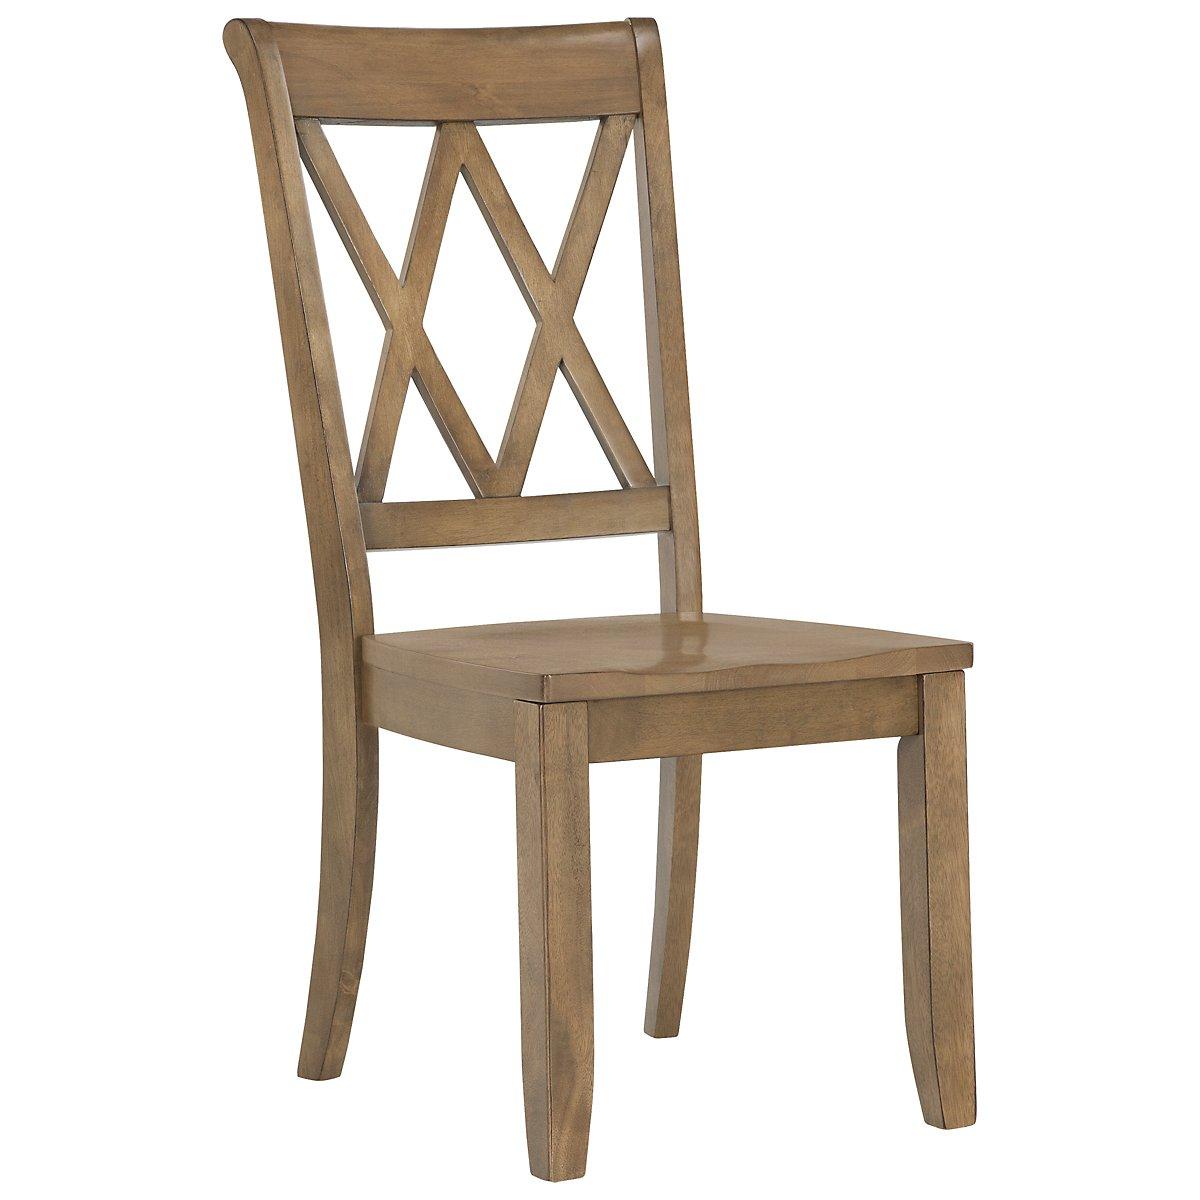 Vintage Light Tone Wood Side Chair